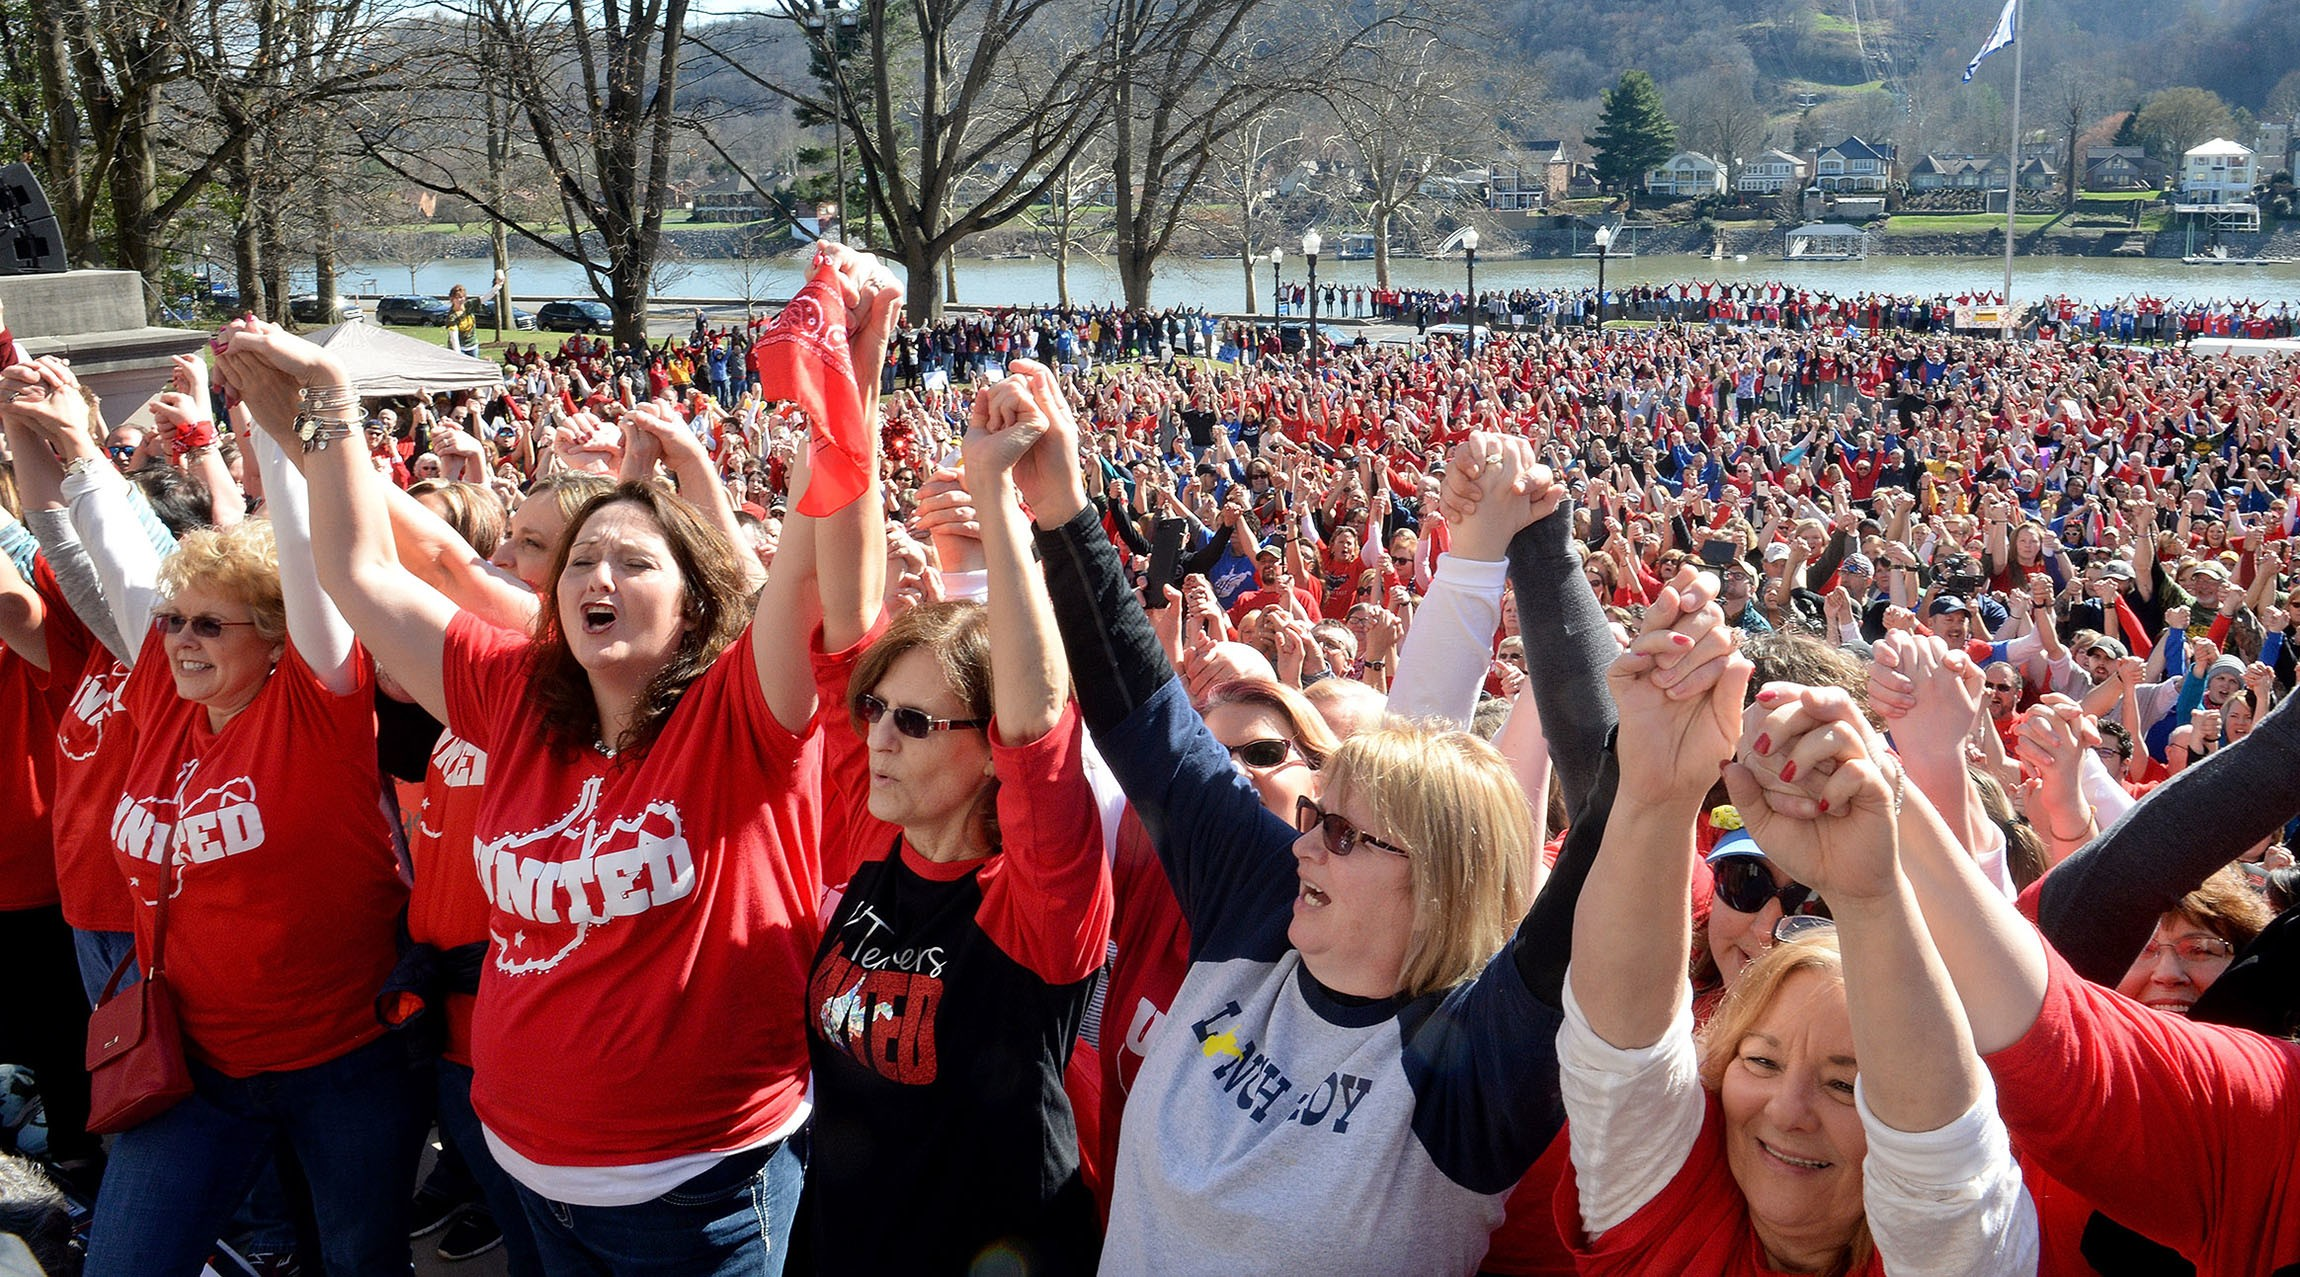 Striking teachers grasp hands during a rally at the West Virginia Capitol in Charleston. (Chris Dorst/Charleston Gazette-Mail via AP)    via Washington Examiner.